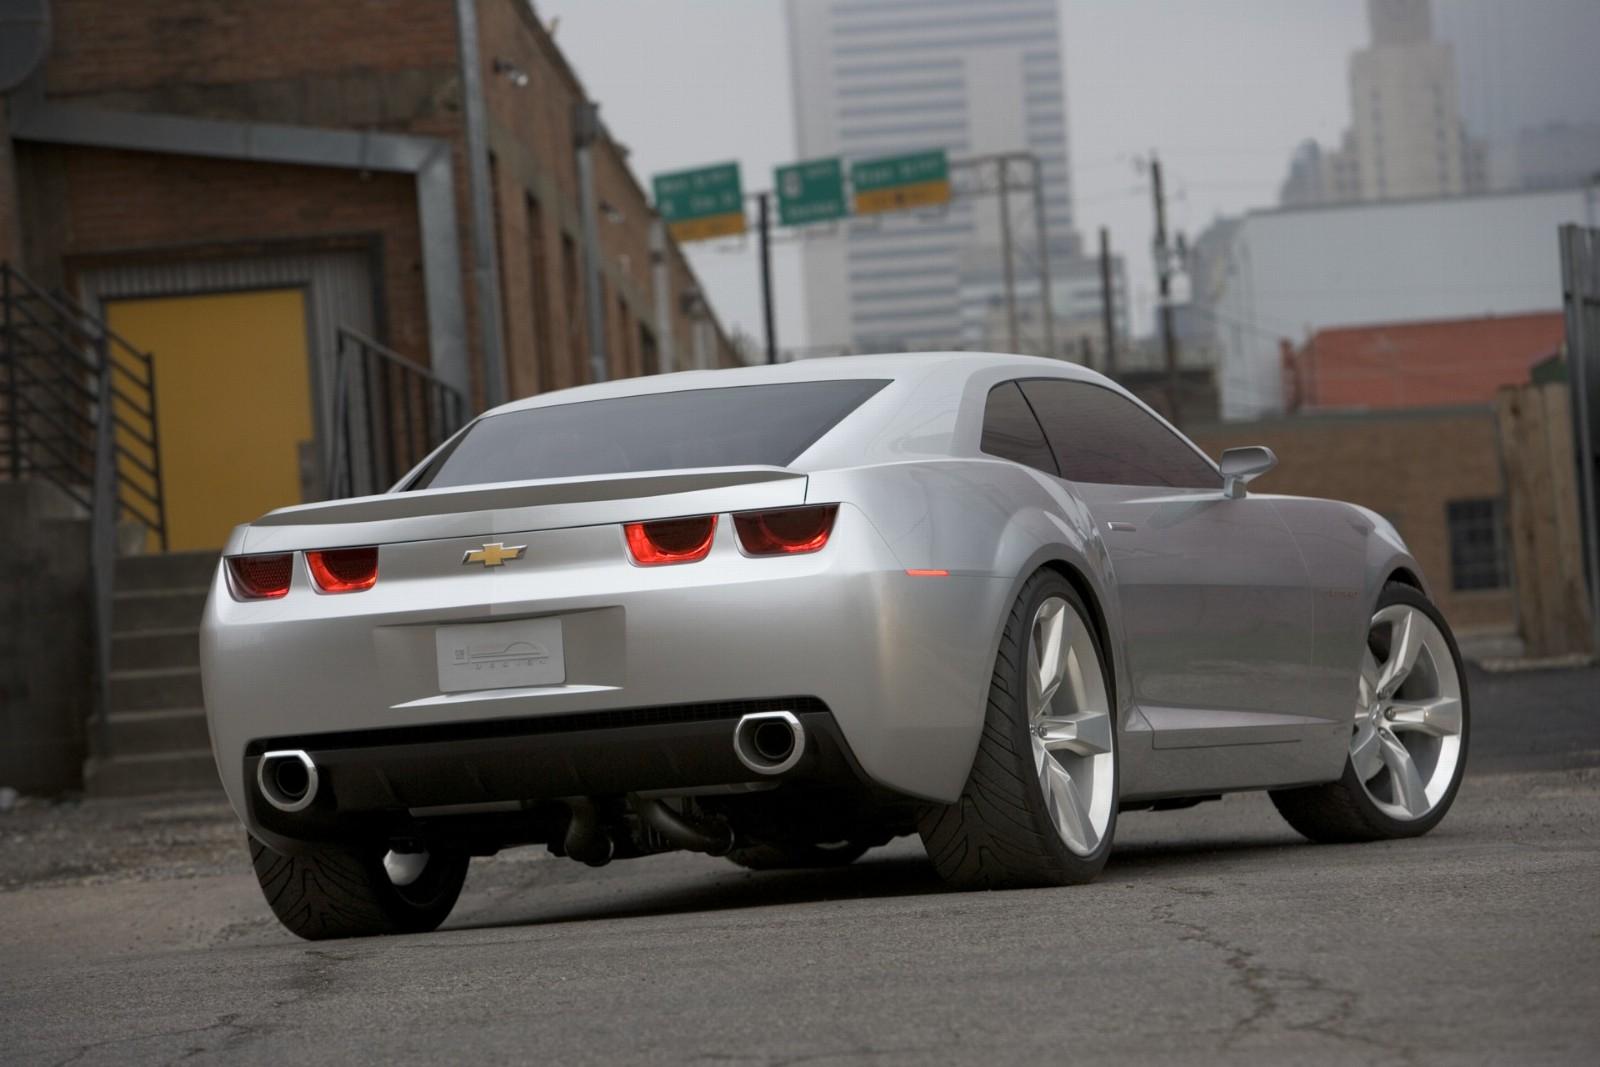 2006 Chevy Camaro >> 2006 Chevrolet Camaro Concept Image Https Www Conceptcarz Com